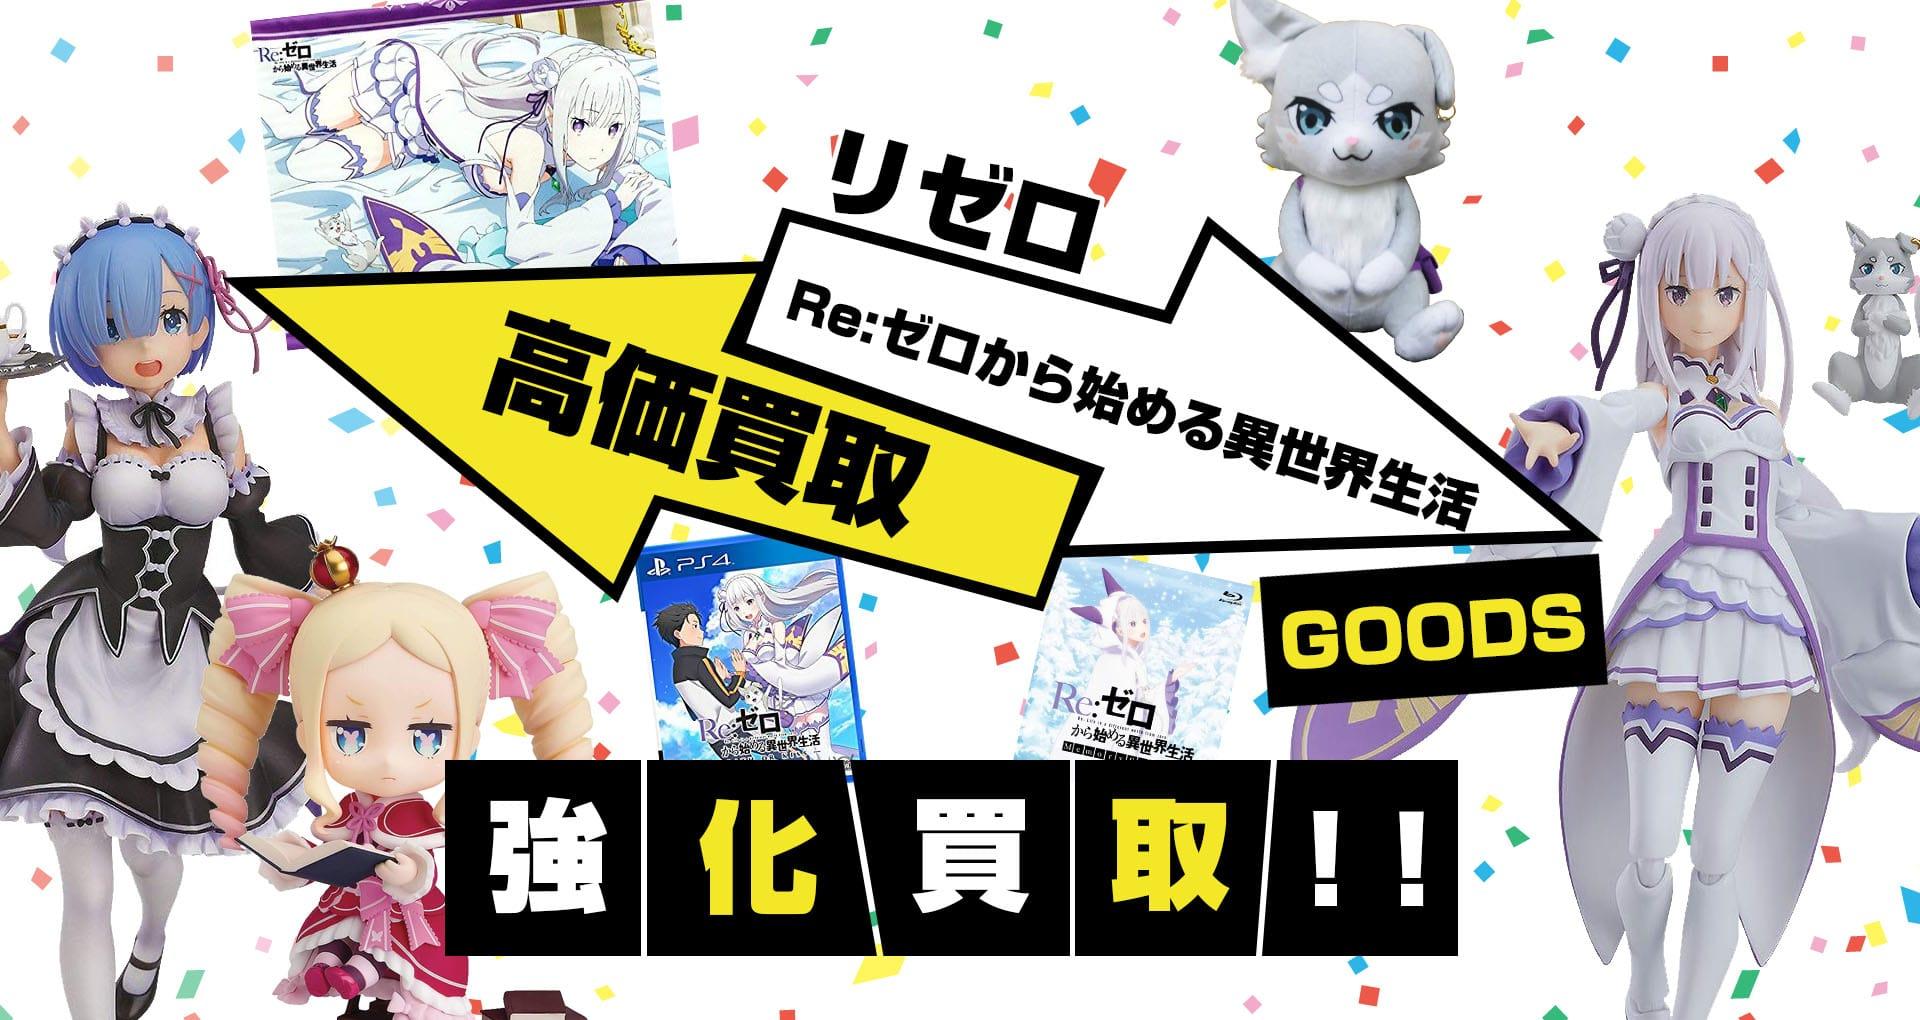 Re:ゼロから始める異世界生活(リゼロ)グッズ買取